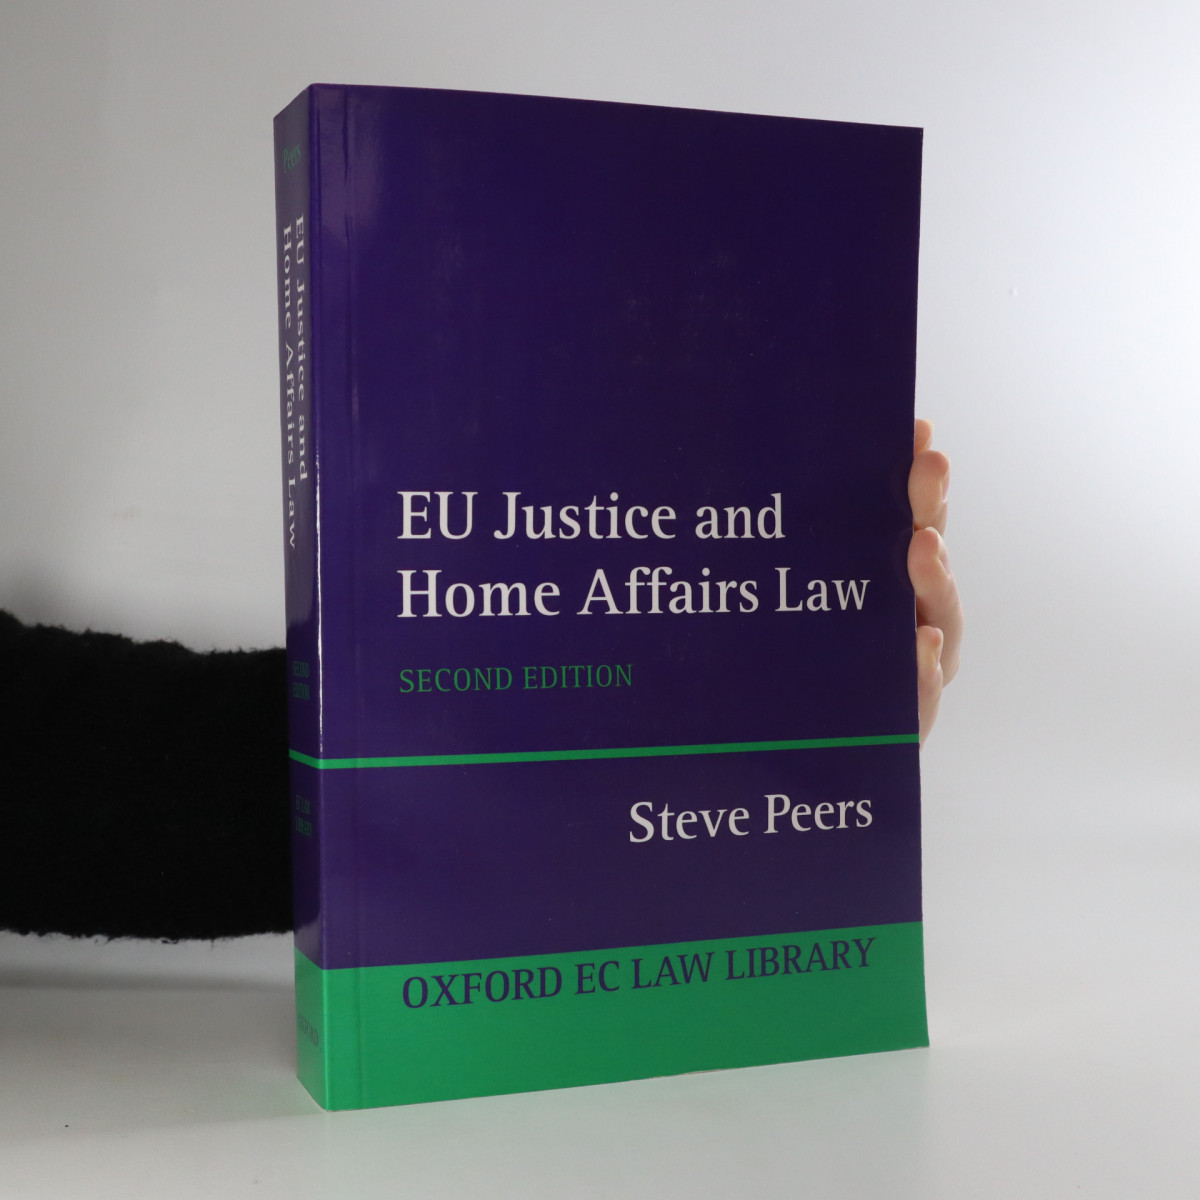 antikvární kniha EU Justice and Home Affairs Law, 2007